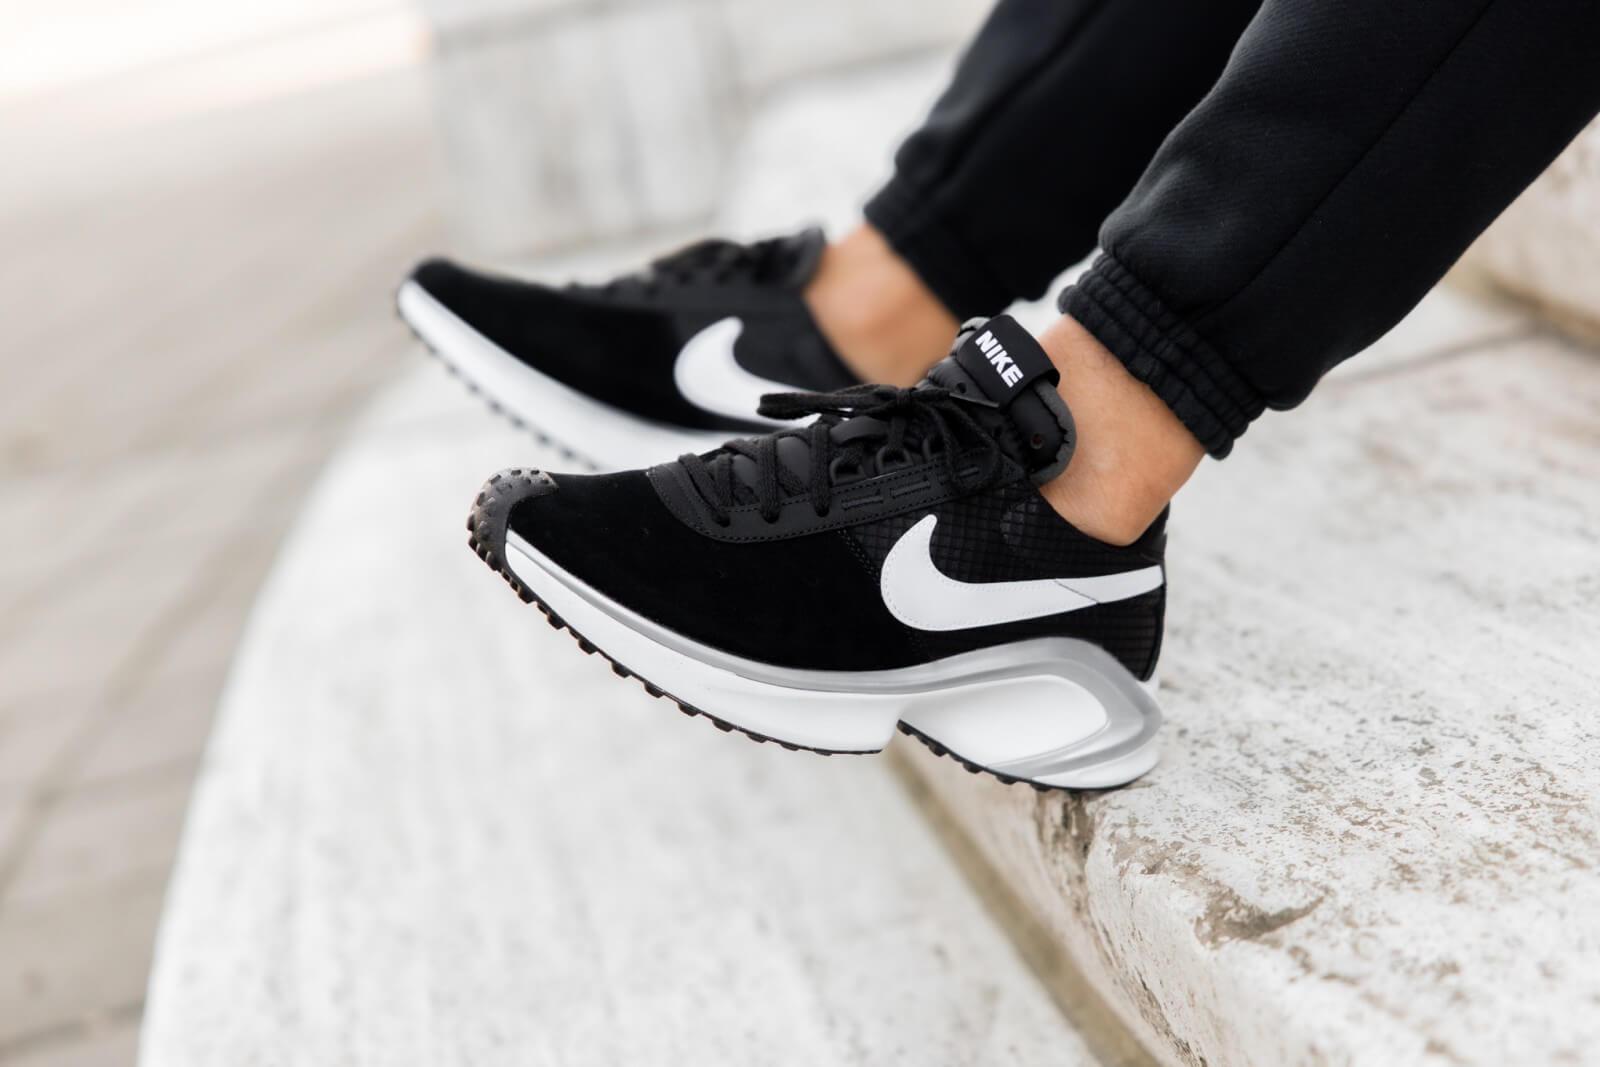 Nike D/MS/X Waffle Black/White-Metallic Silver - CQ0205-001